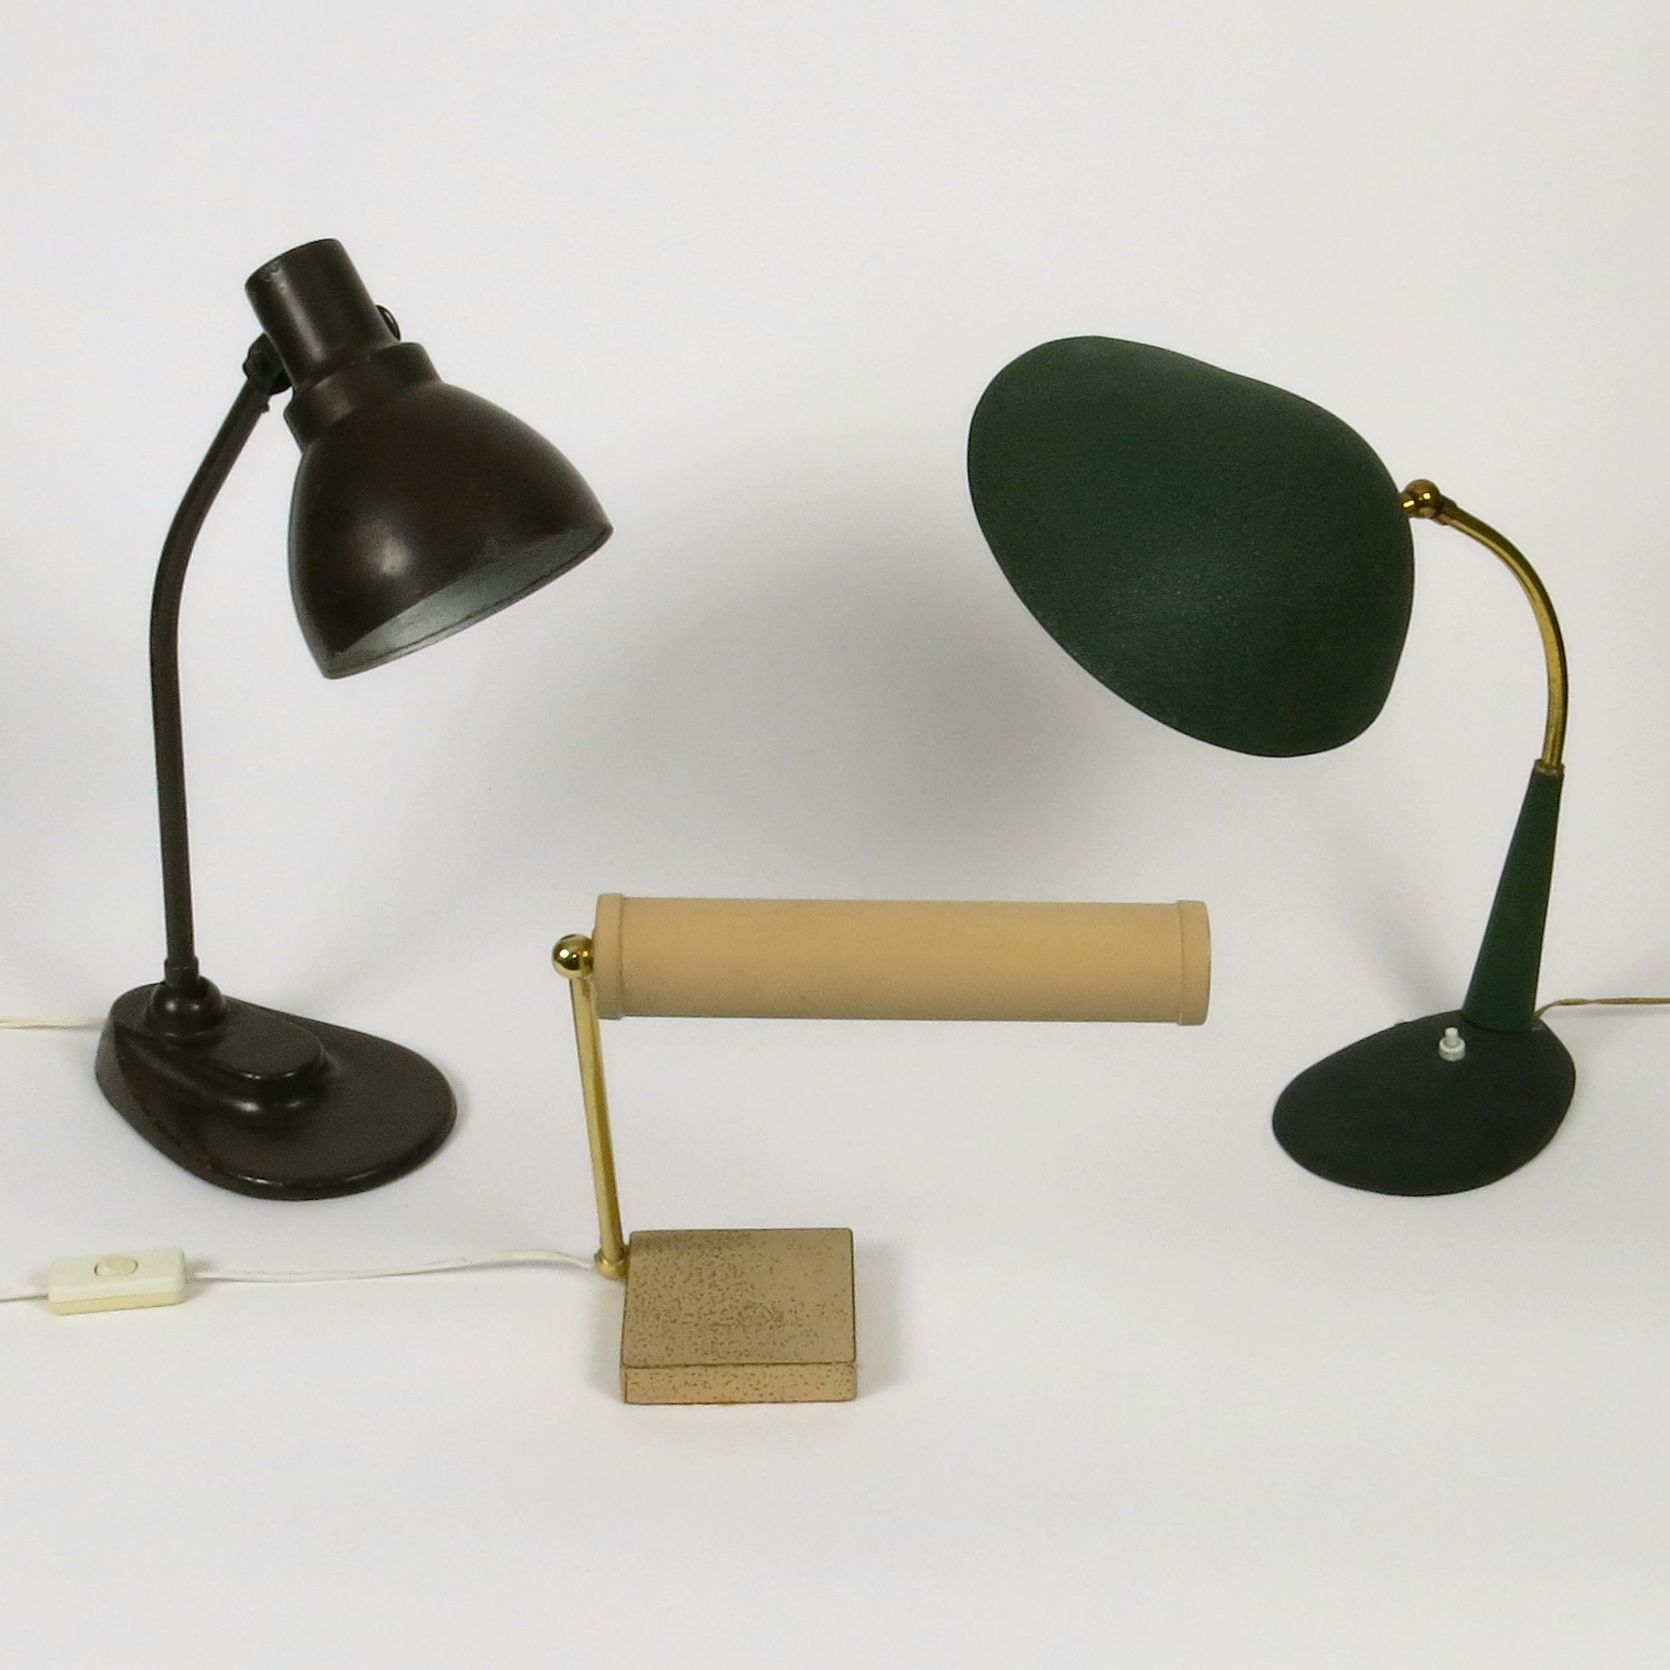 Div Antike Tischlampen Mobel Zurich Vintagemobel